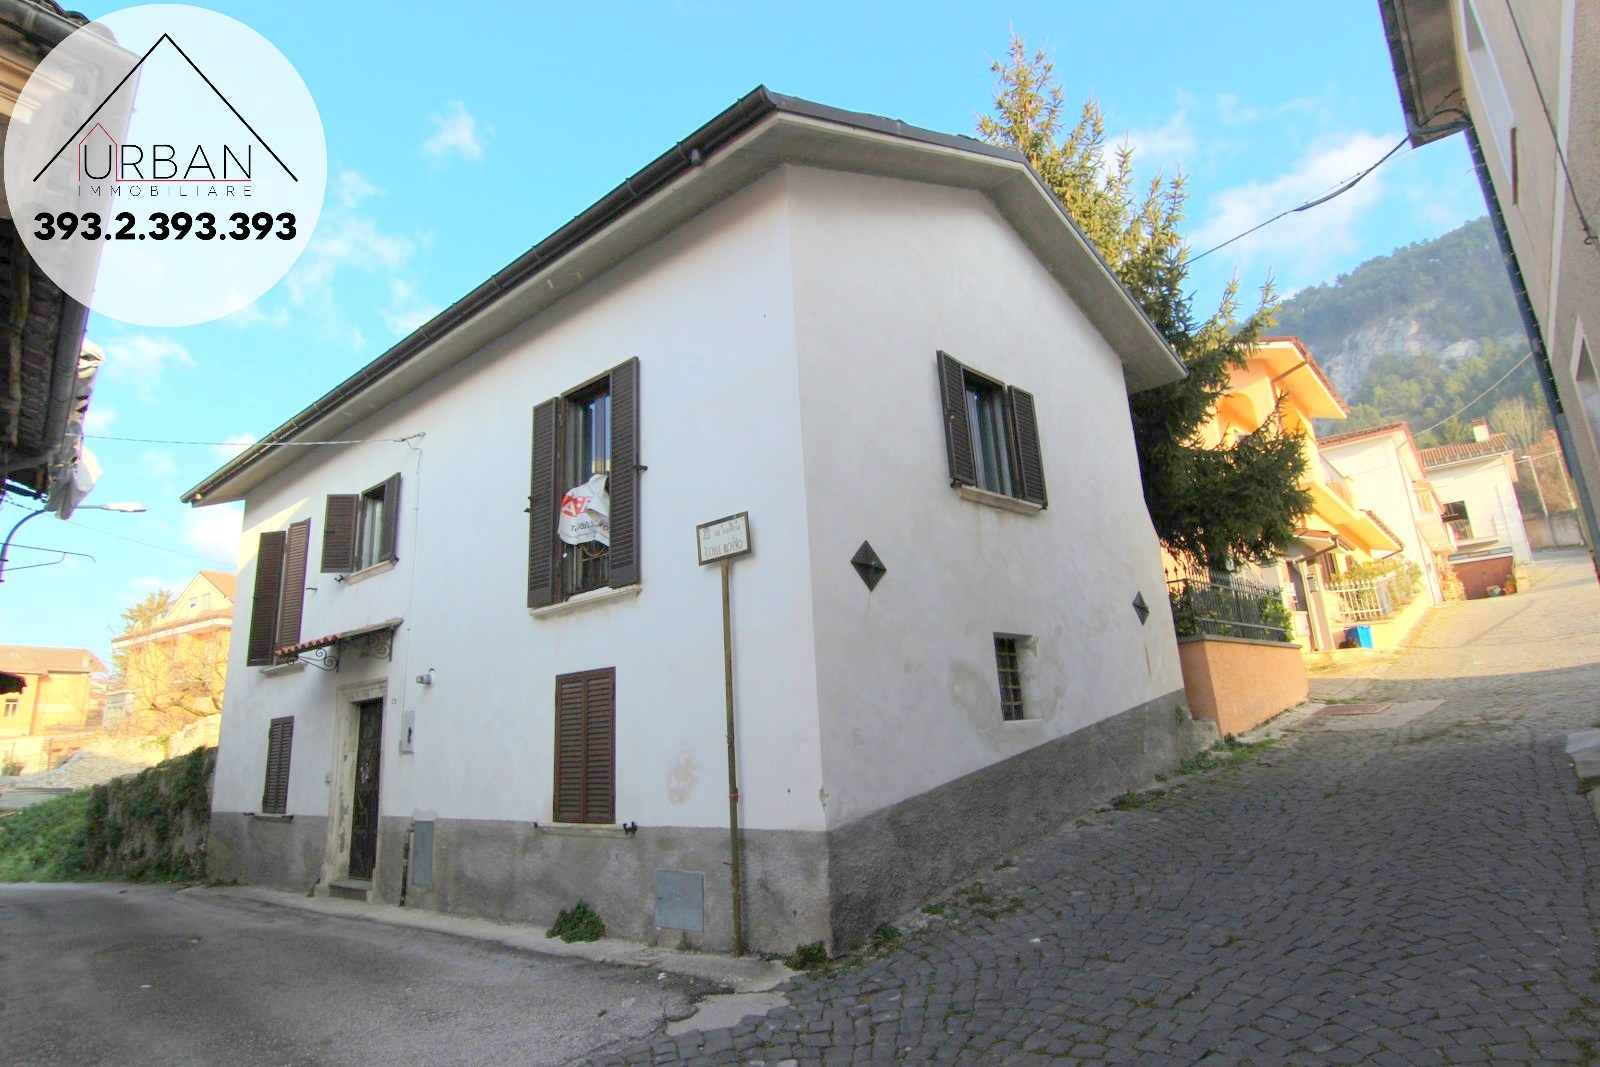 PIZZOLI (AQ) - Via Traversa Colle Rosso